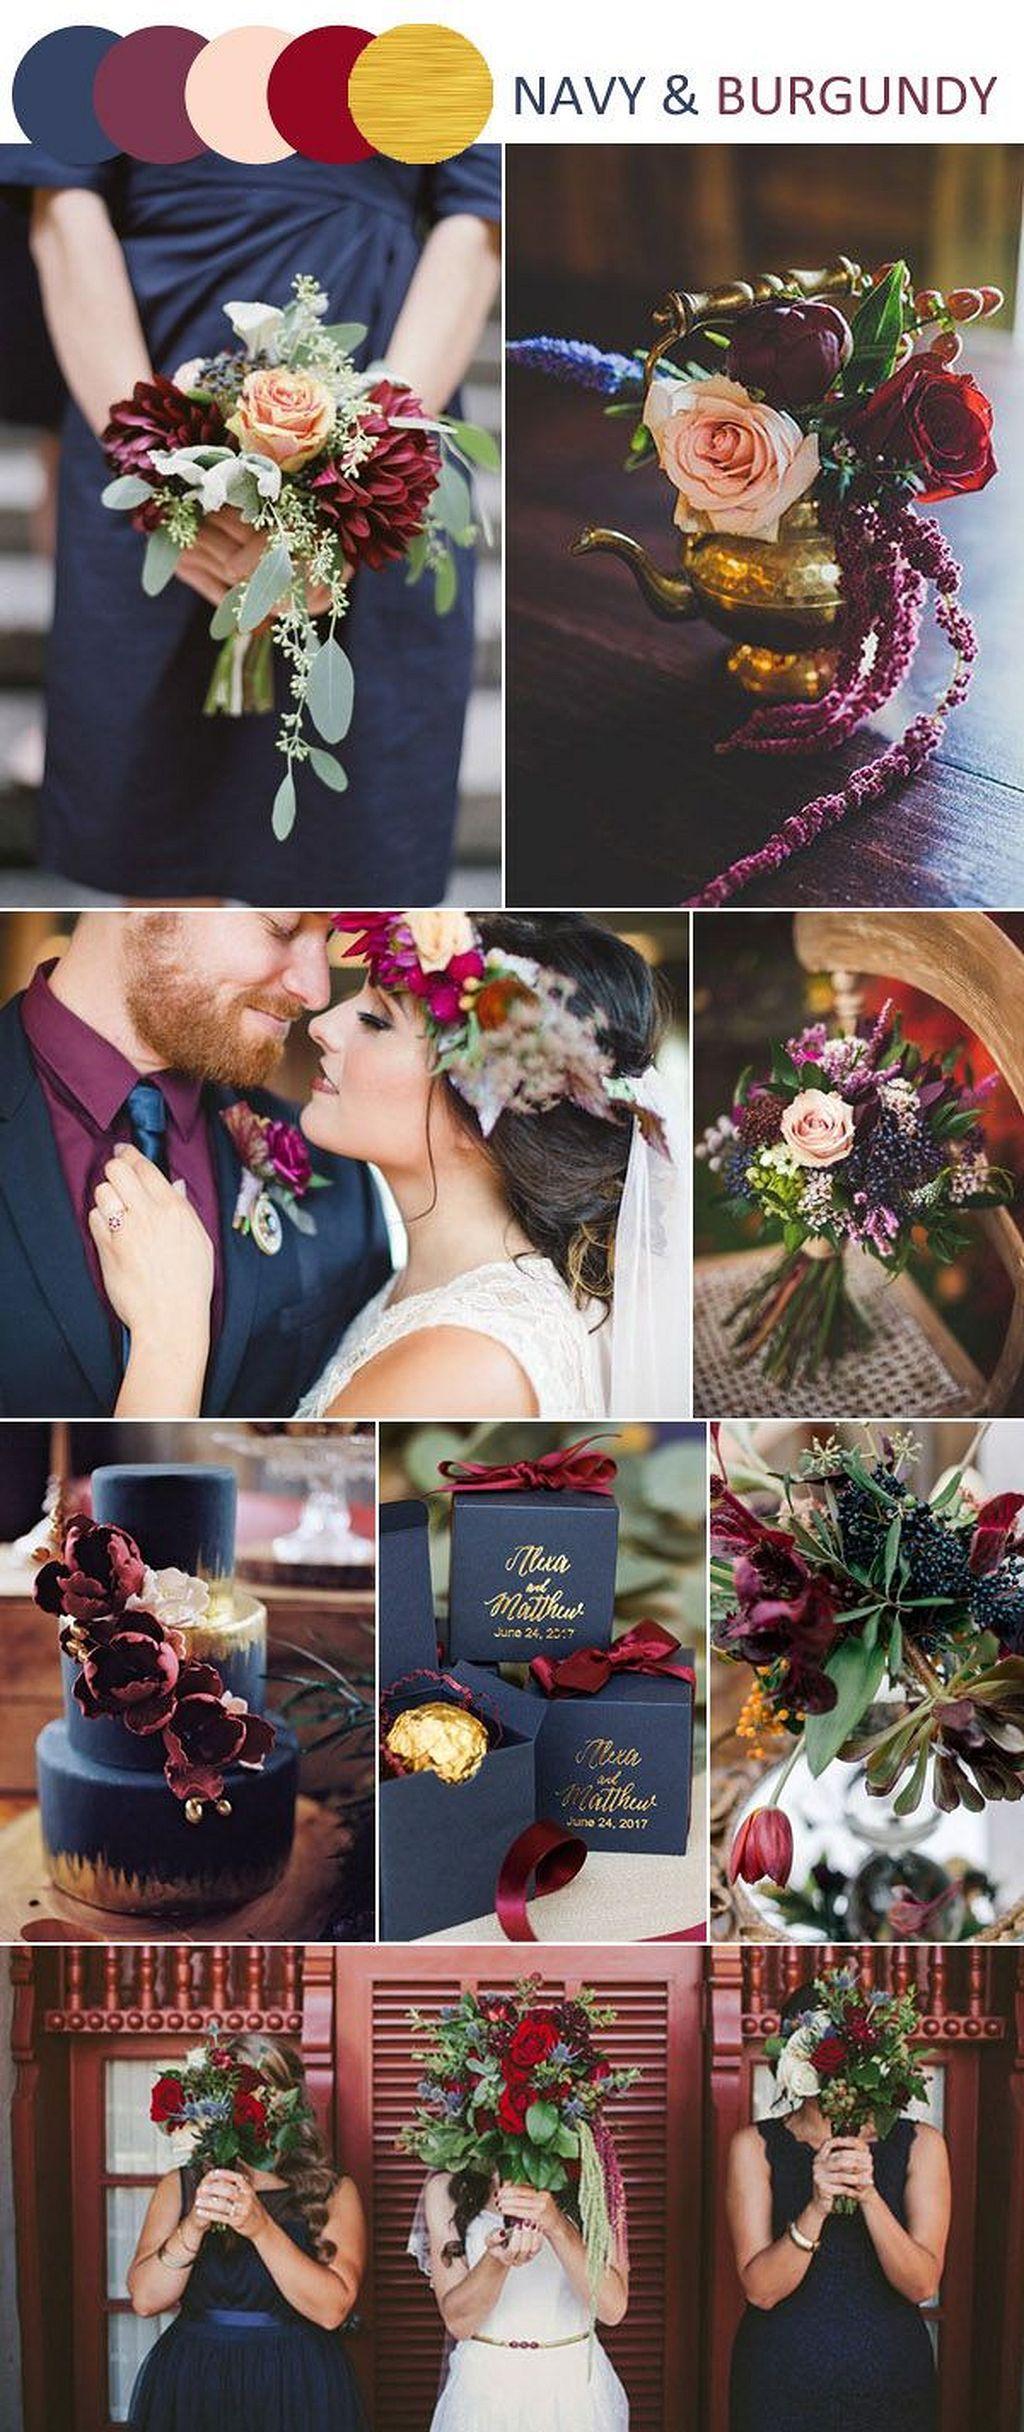 Wedding decorations reception october 2018 Pin by Maddy Armstrong on Sammyus Wedding  Pinterest  Wedding